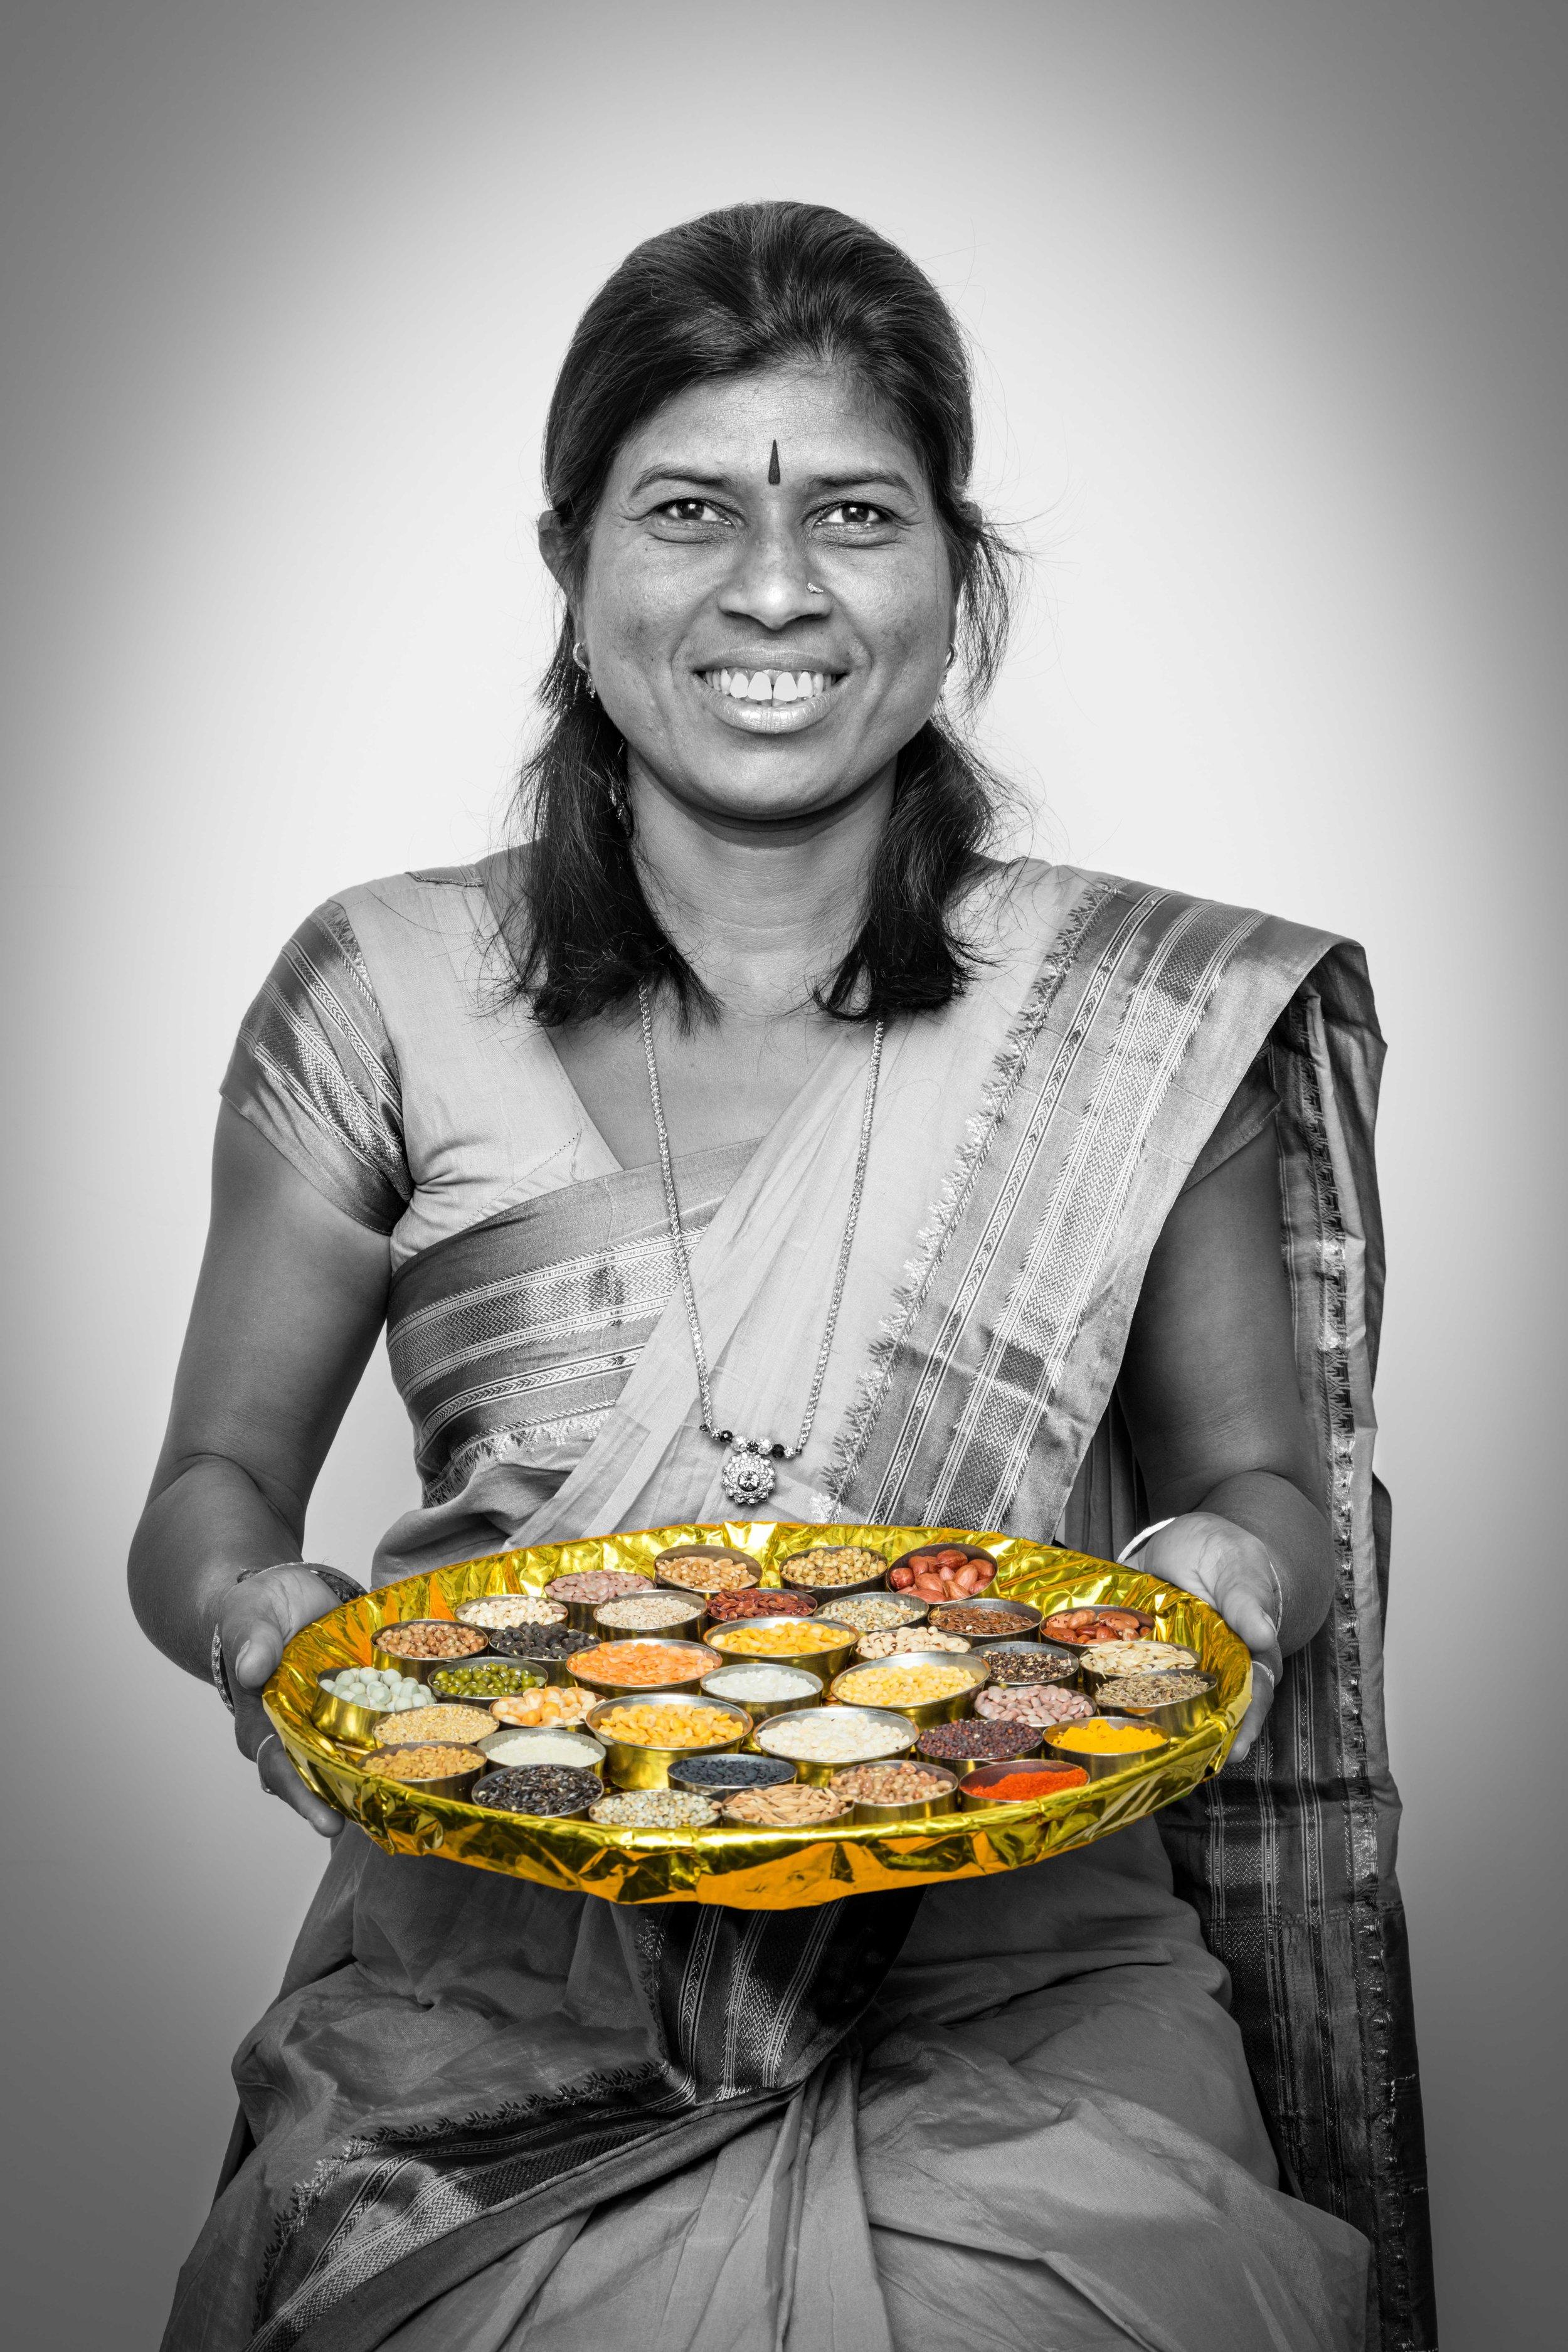 Kamal Shivling Kumbhar, UNDP Equator Prize Winner, Swayan Shikshan, India